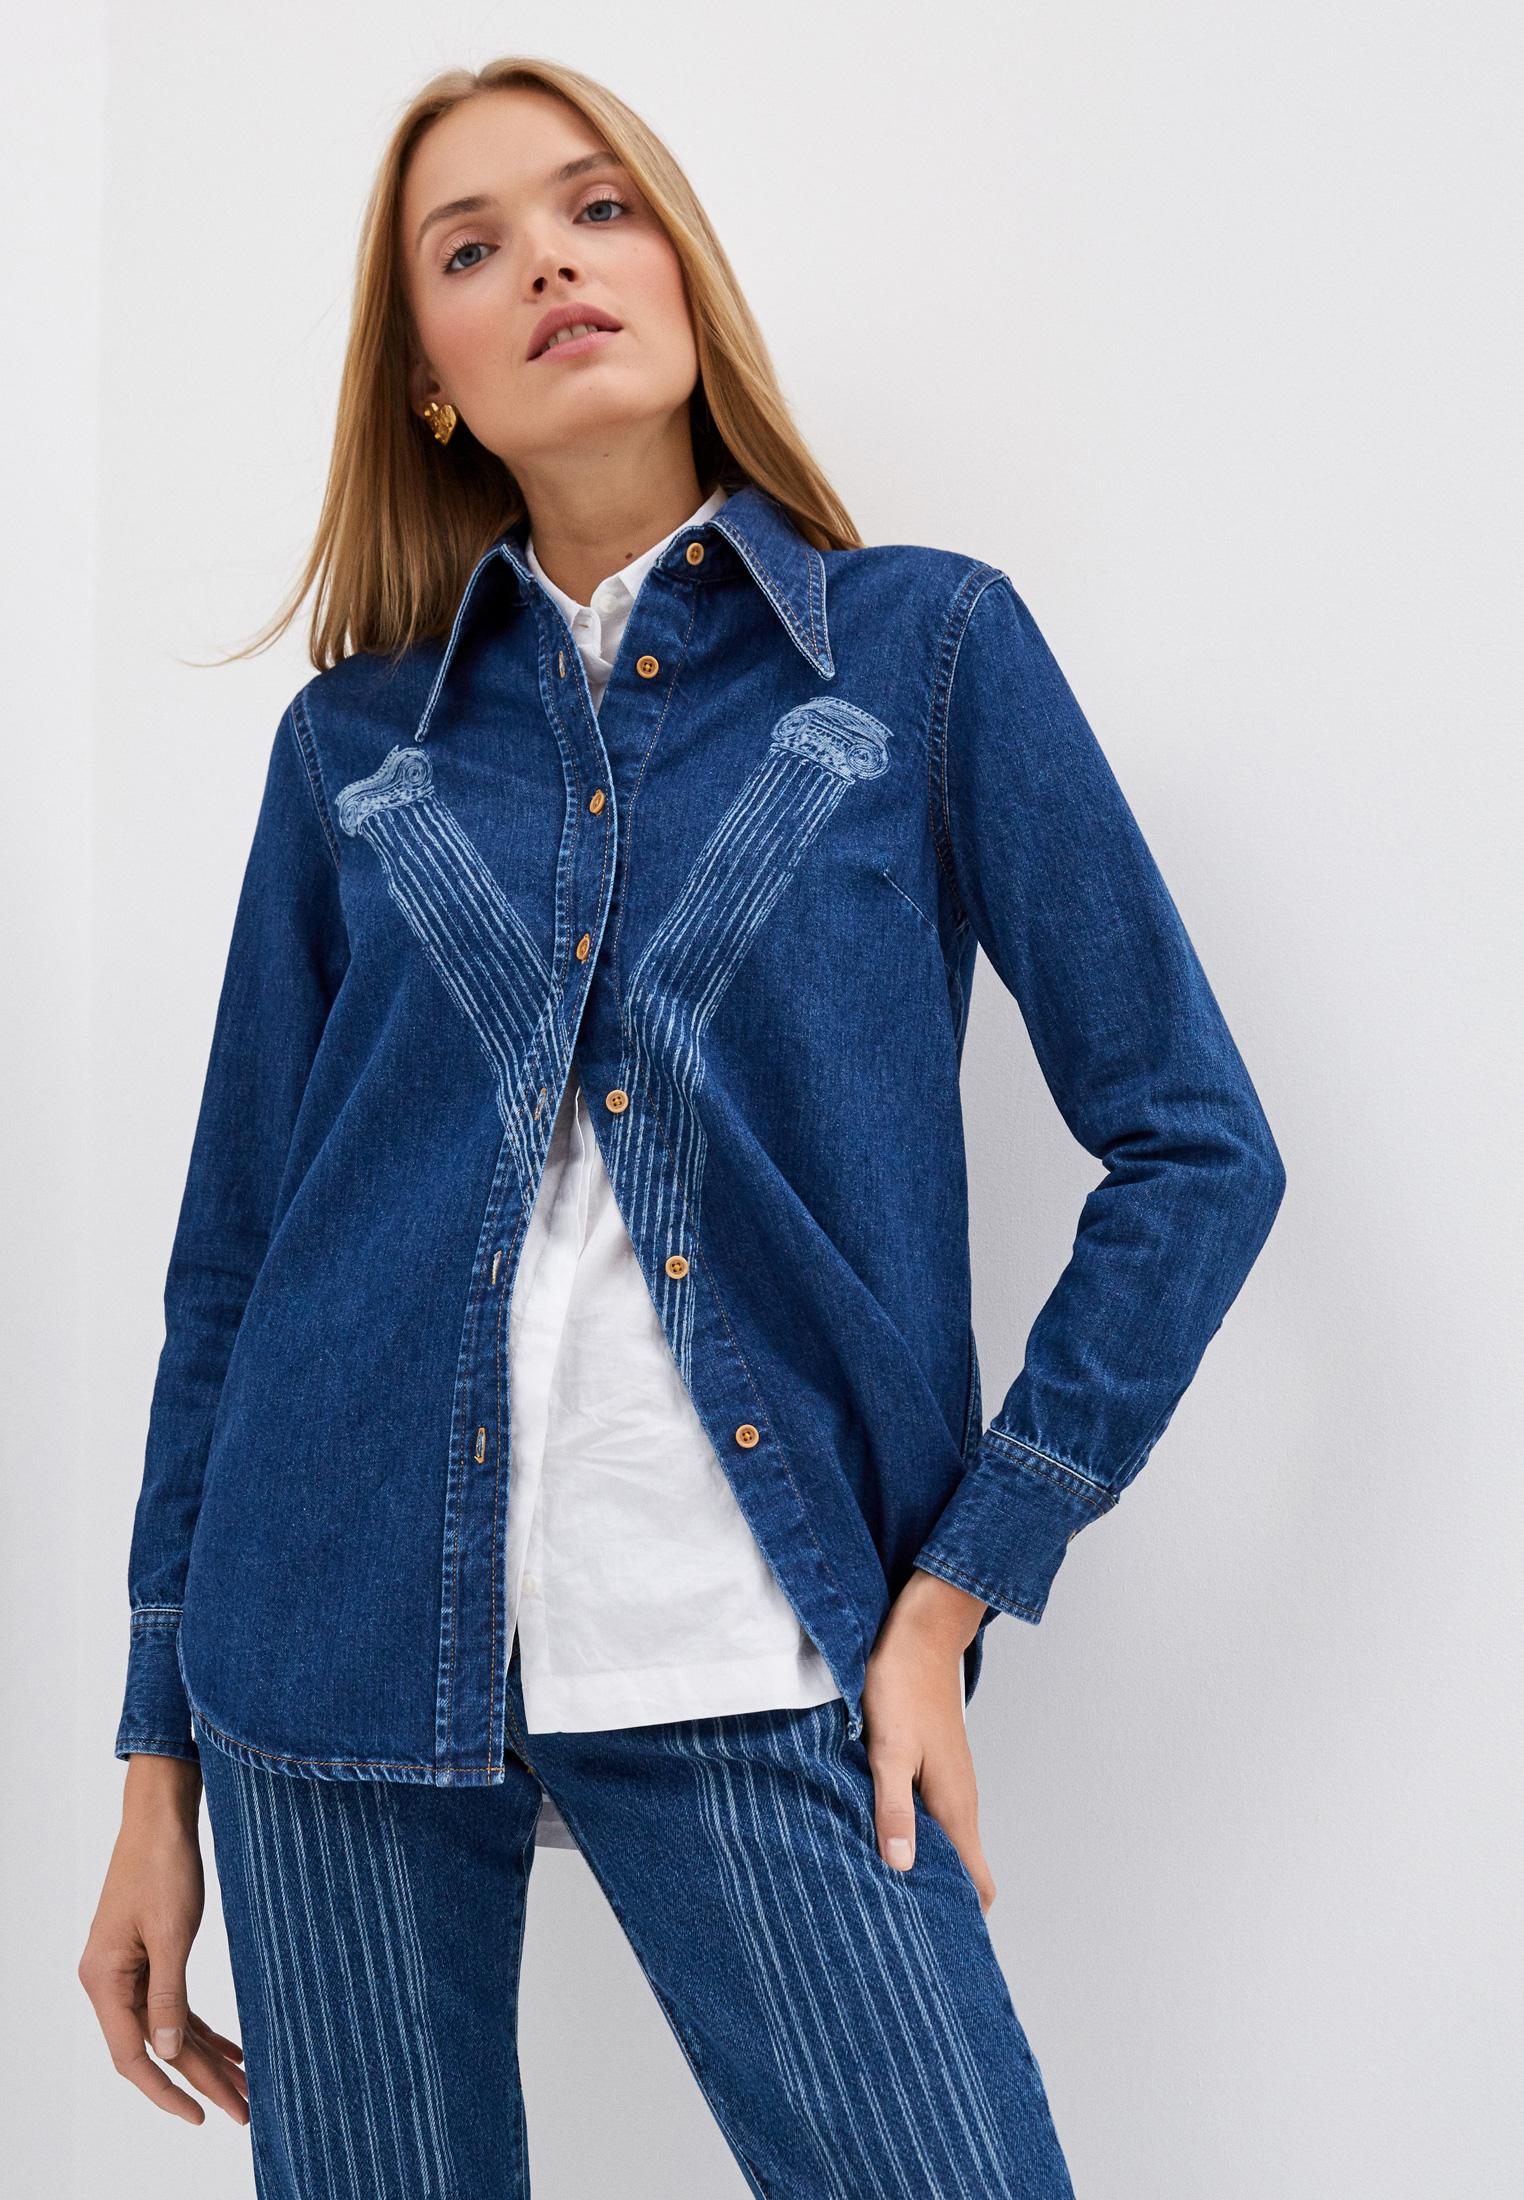 Рубашка Vivienne Westwood 19050005-11431-DE